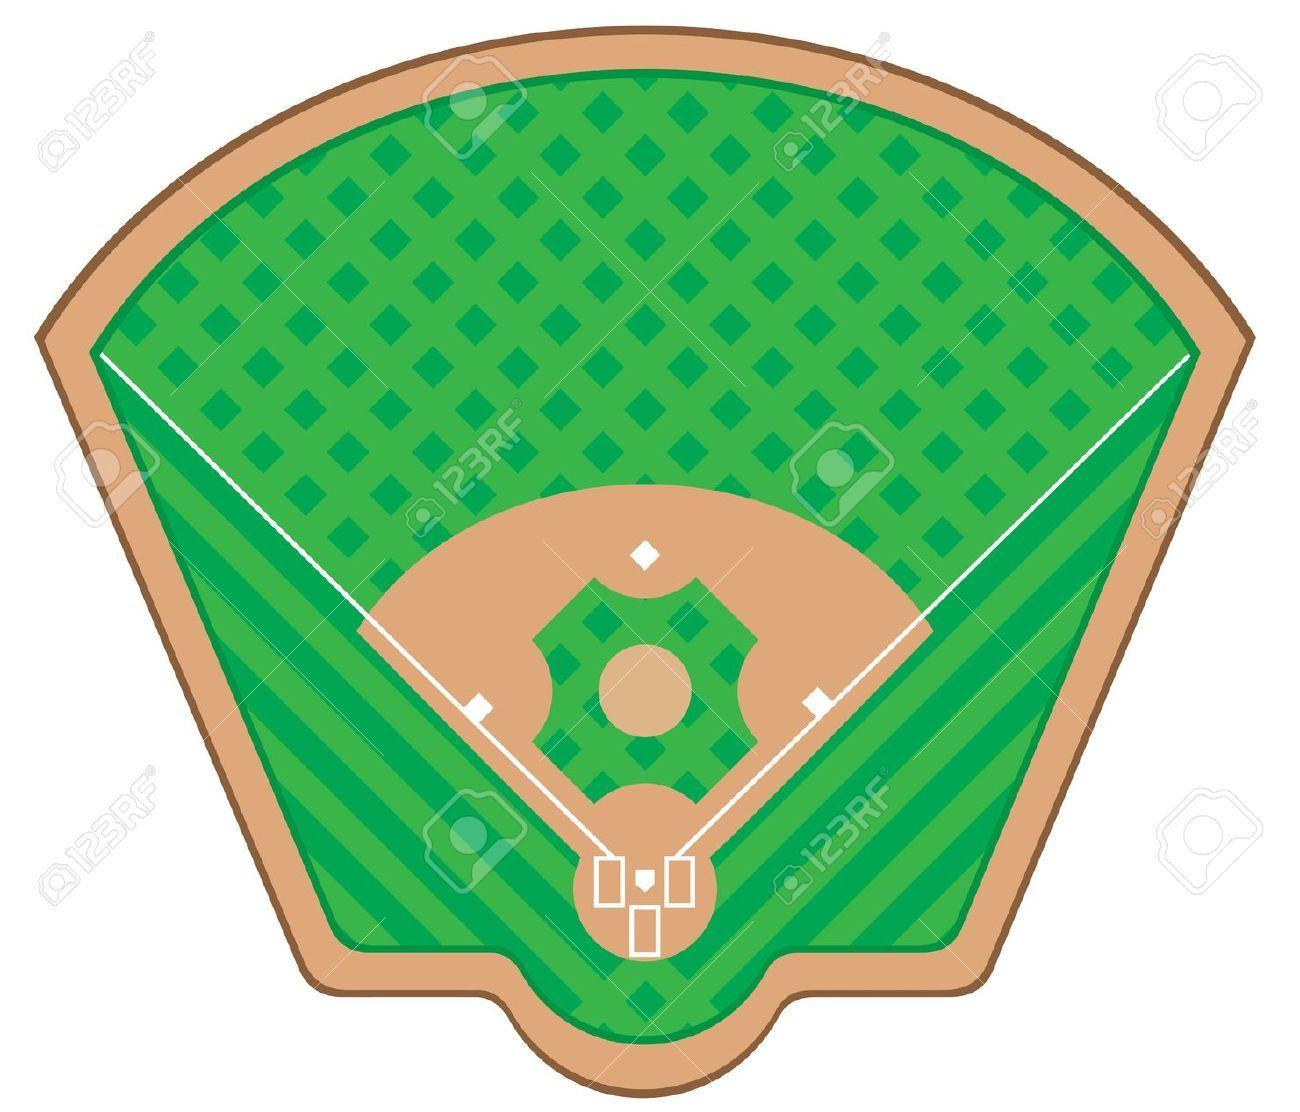 1300x1112 Black And White Baseball Field Clipart